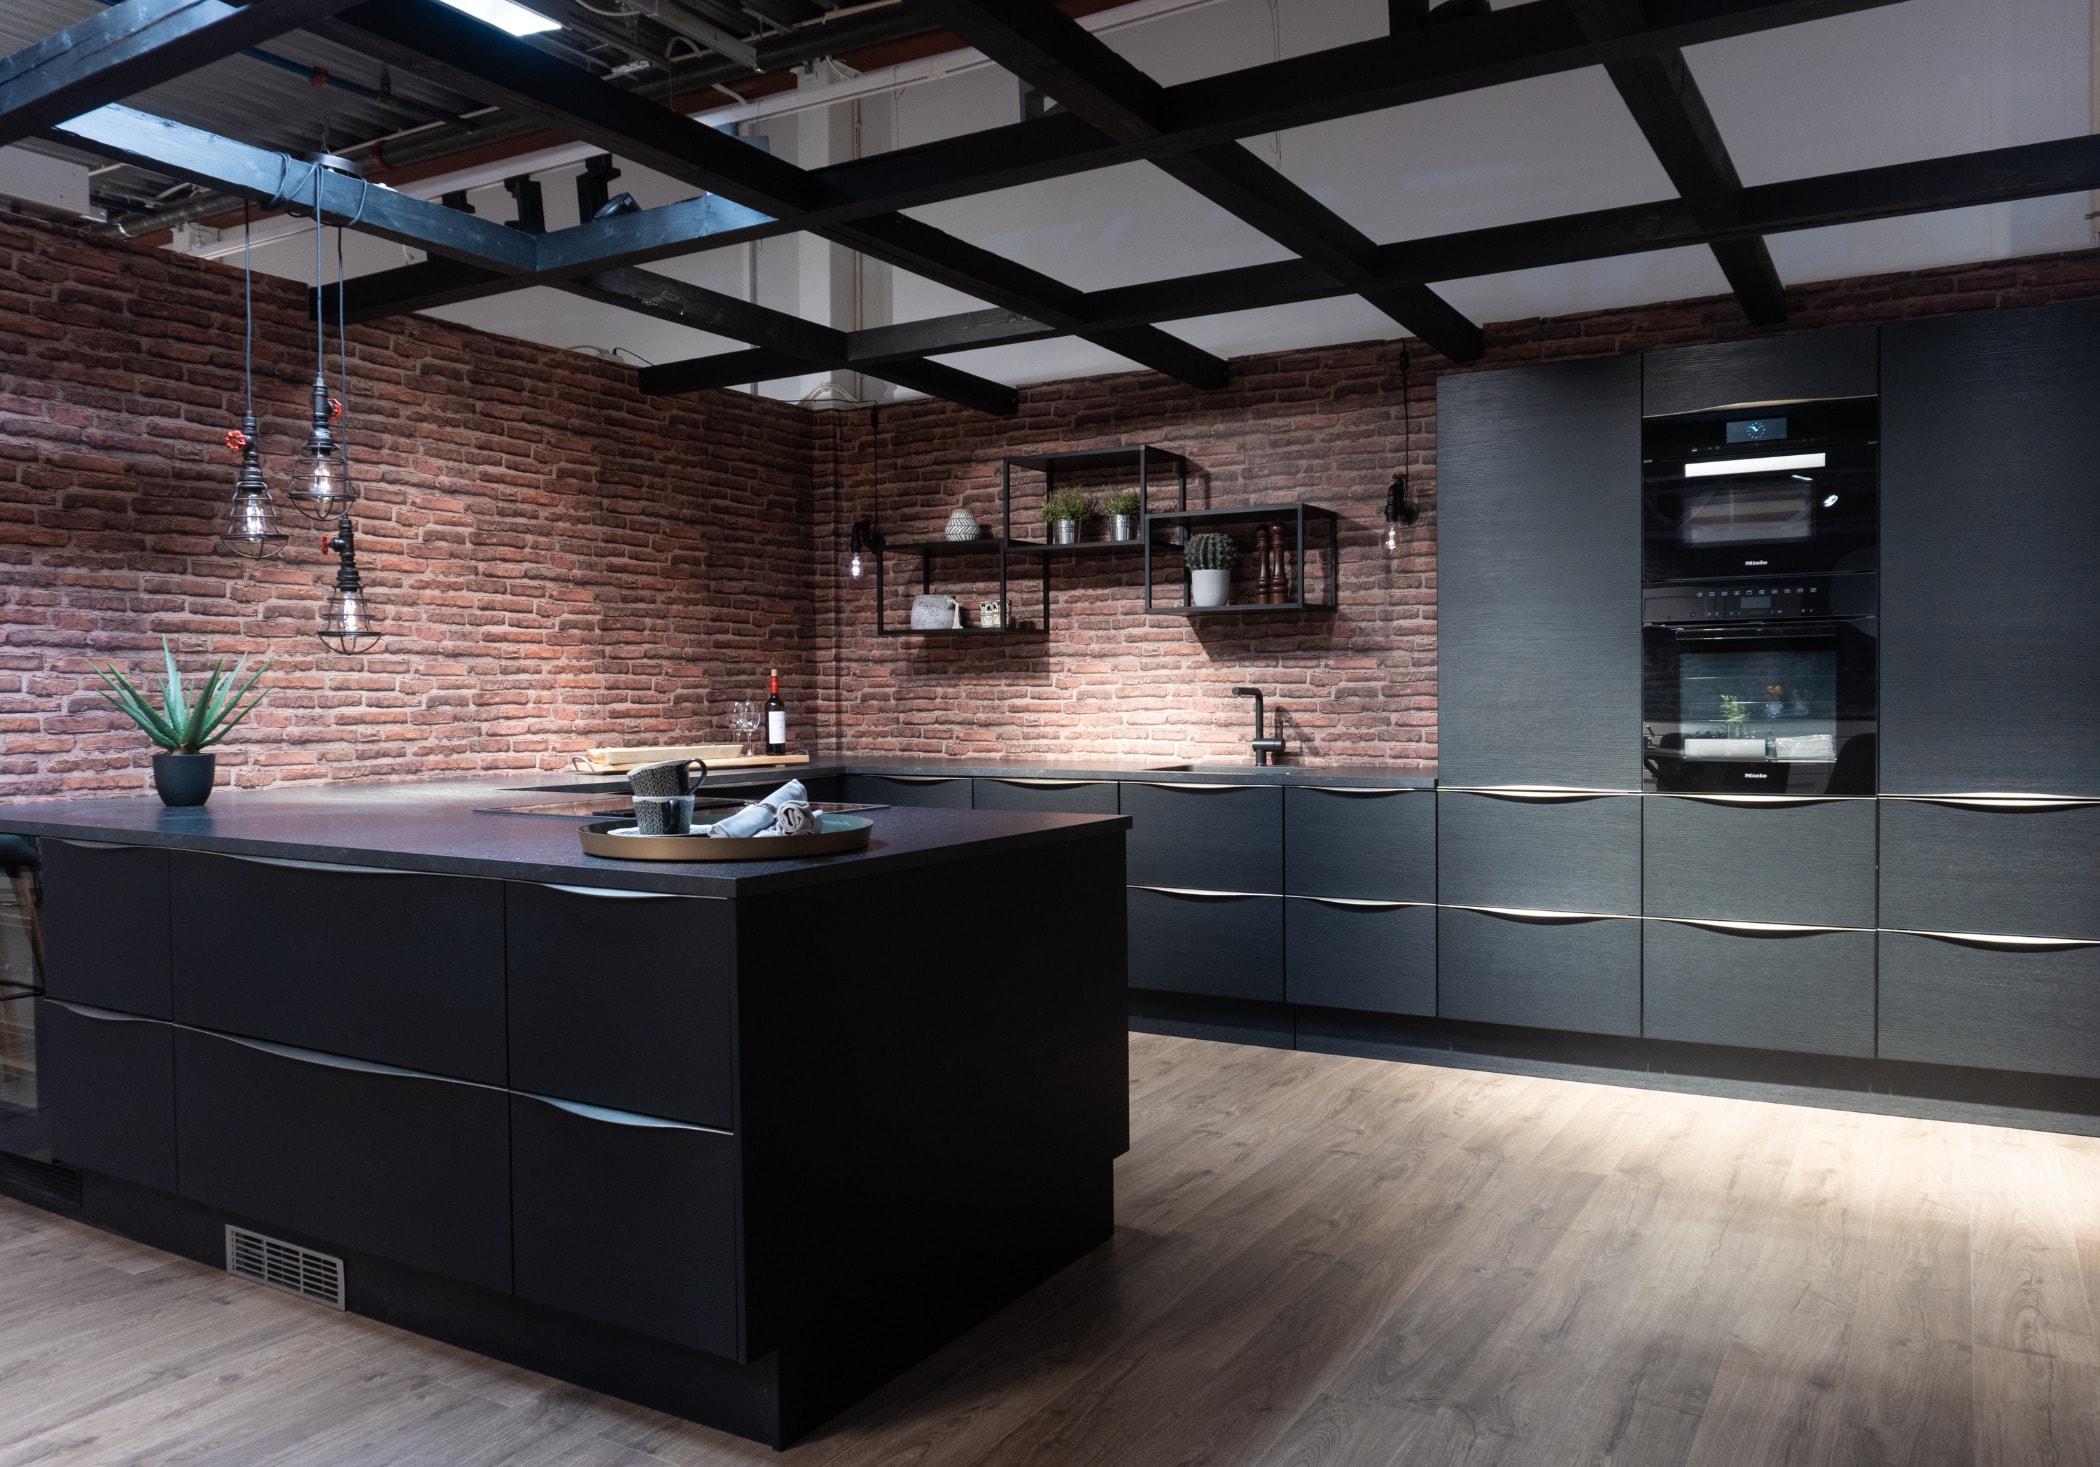 Interior design, Floor, Tile, Ceiling, Property, Furniture, Kitchen, Room, Cabinetry, Countertop